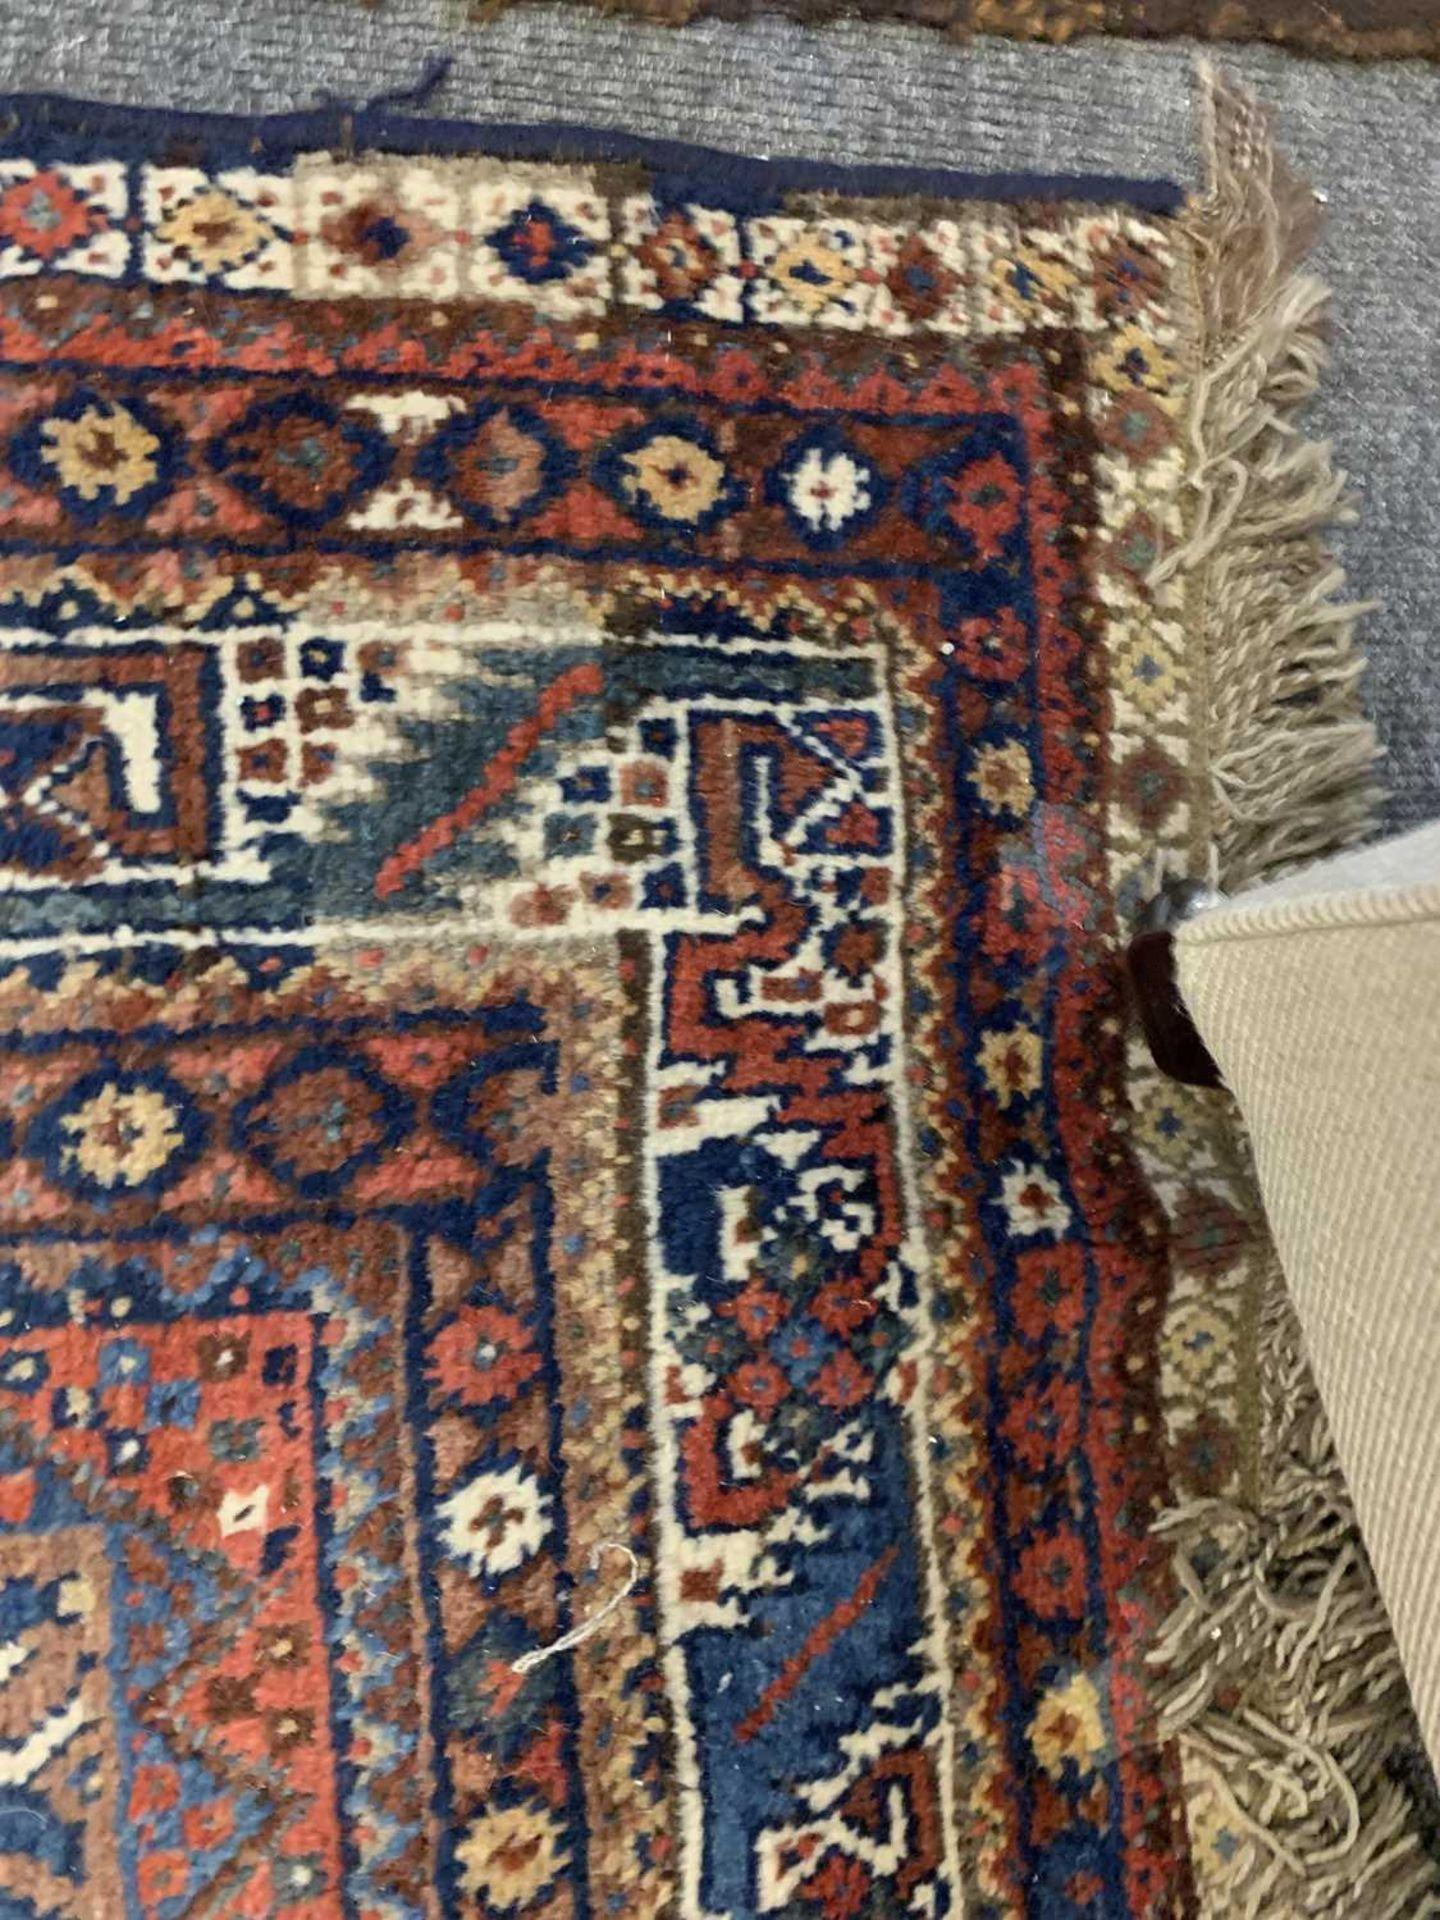 A South West Persian Khamseh carpet, - Image 5 of 17